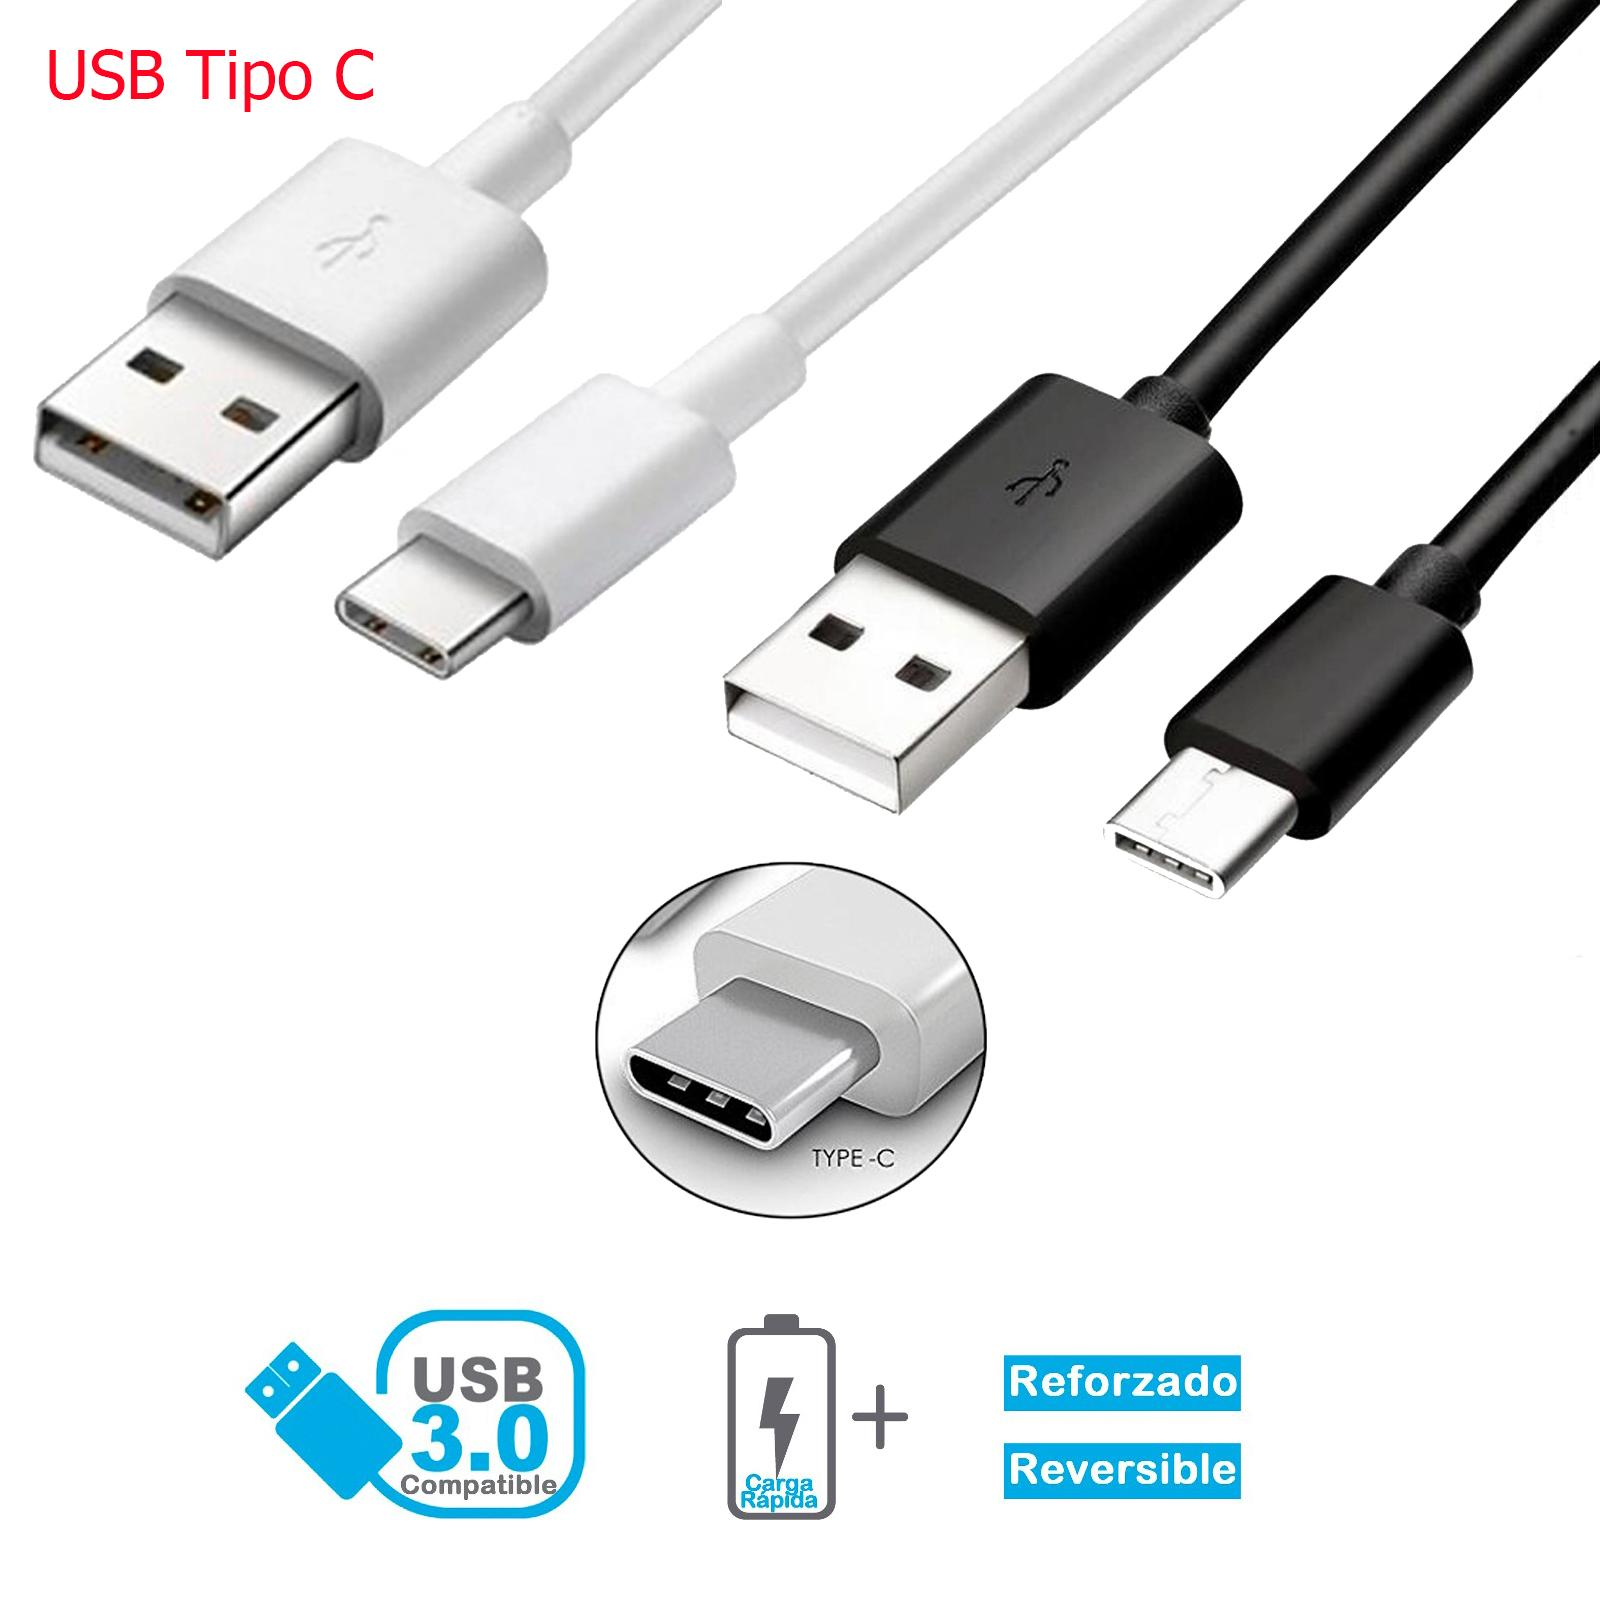 USB Type C шнур для мобильного телефона Realme 6 quick Charge и Data 1 poke длина и 2 метра